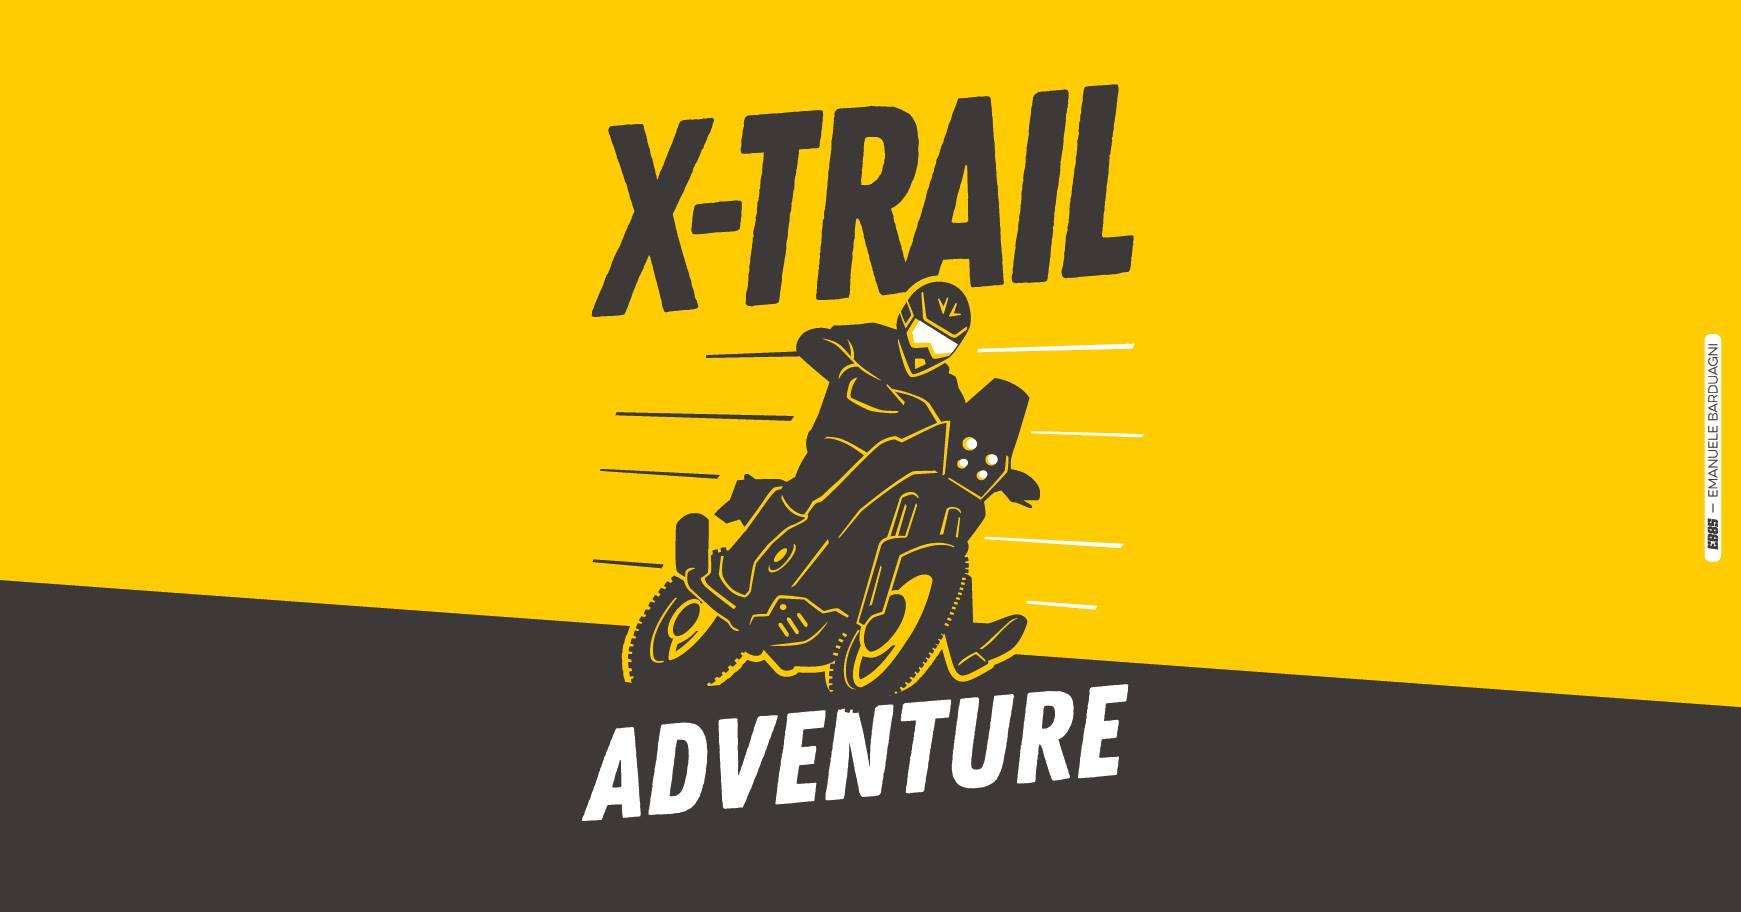 italiainpiega-evento-moto off road 2021-x-trail adventure